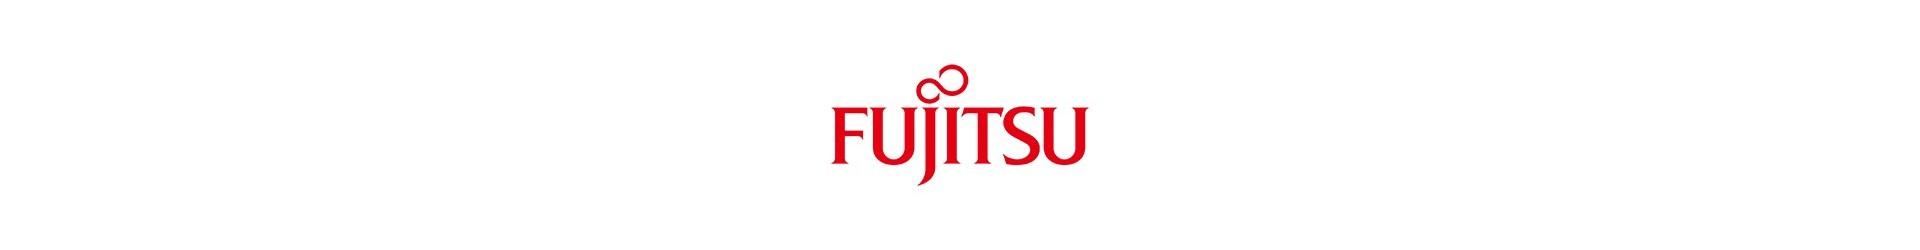 Fujitsu (Gewerbliche)